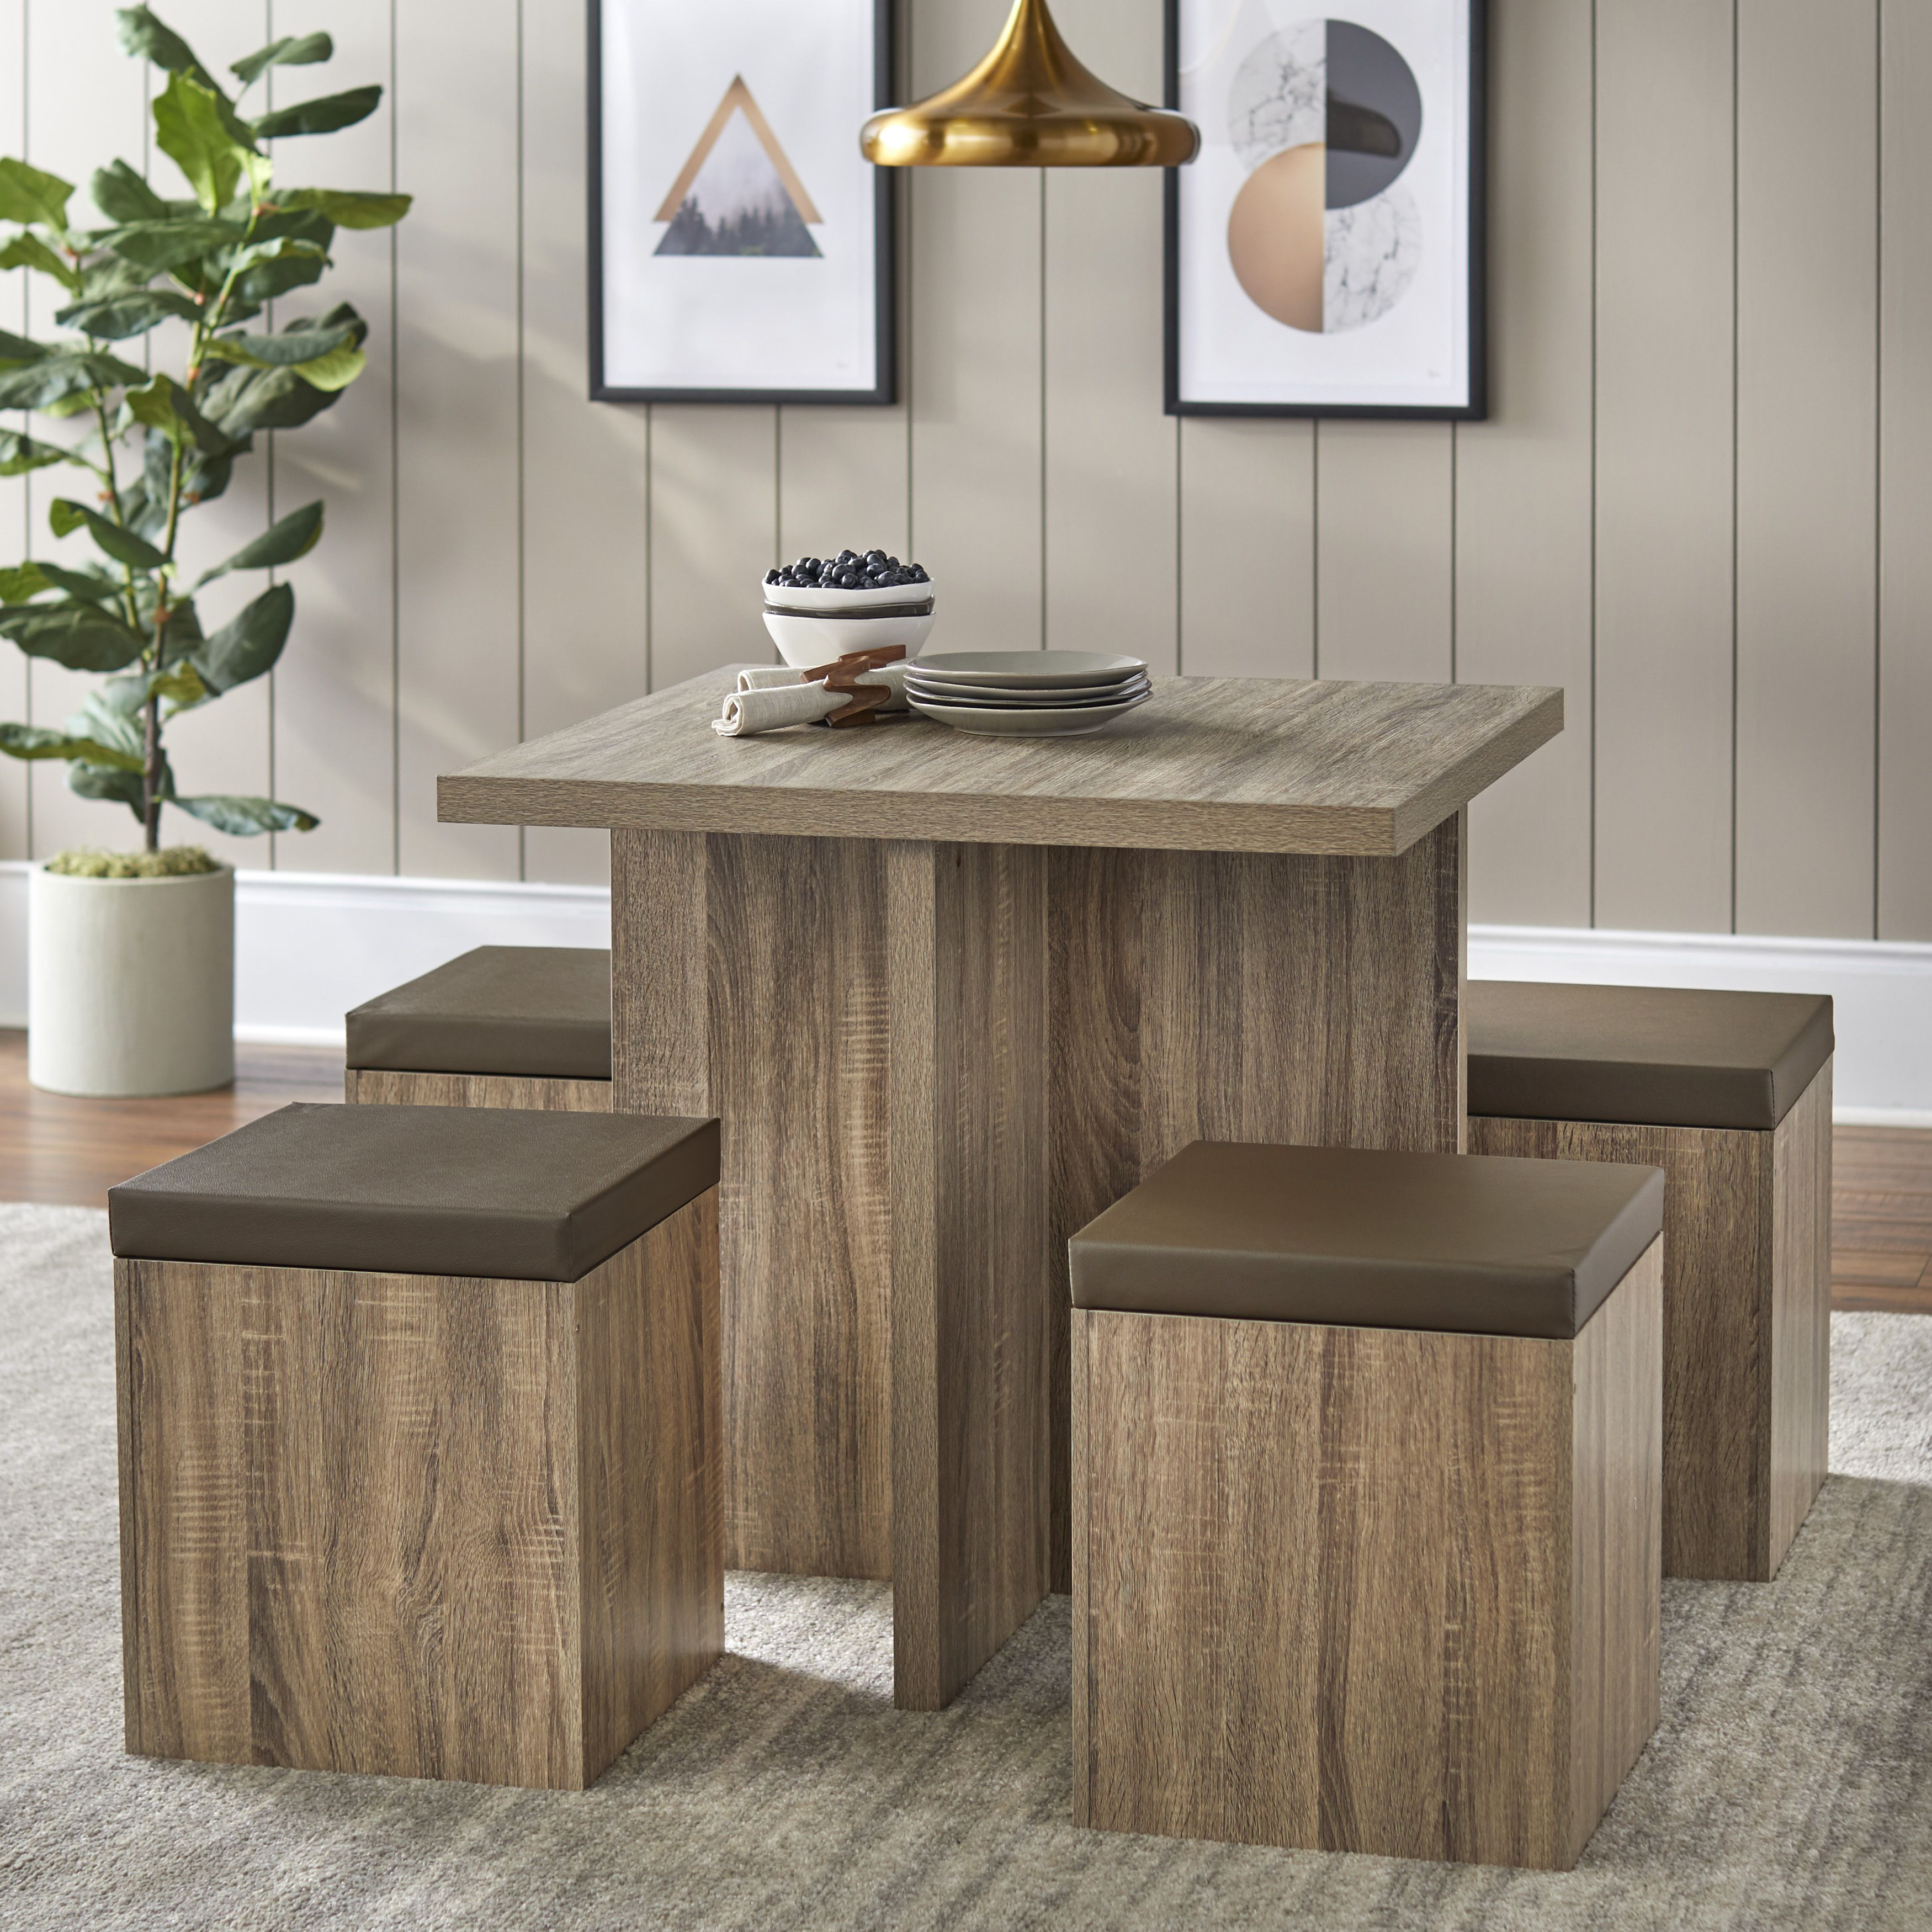 mainstays 5piece dexter dining set with storage ottoman